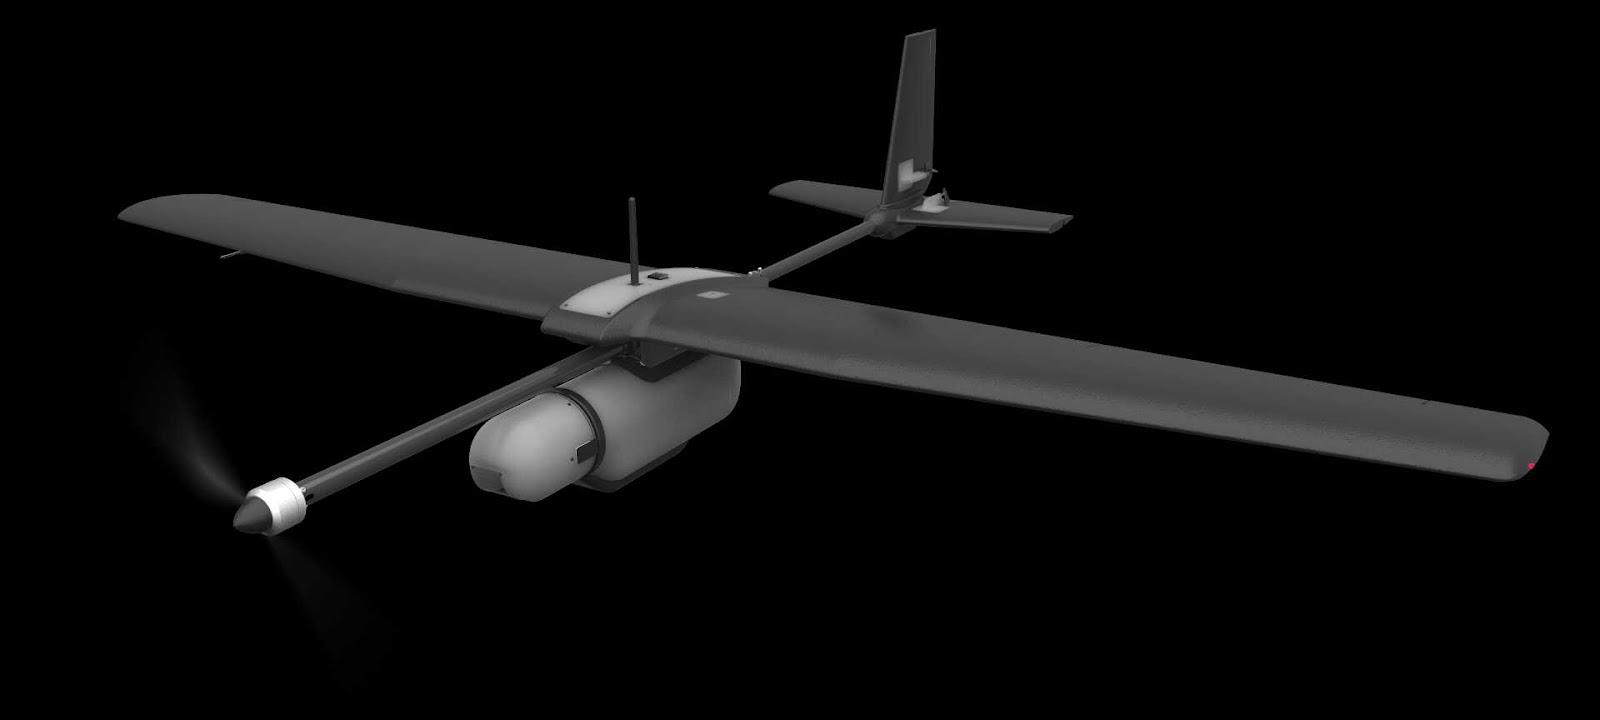 CYGNUS drone